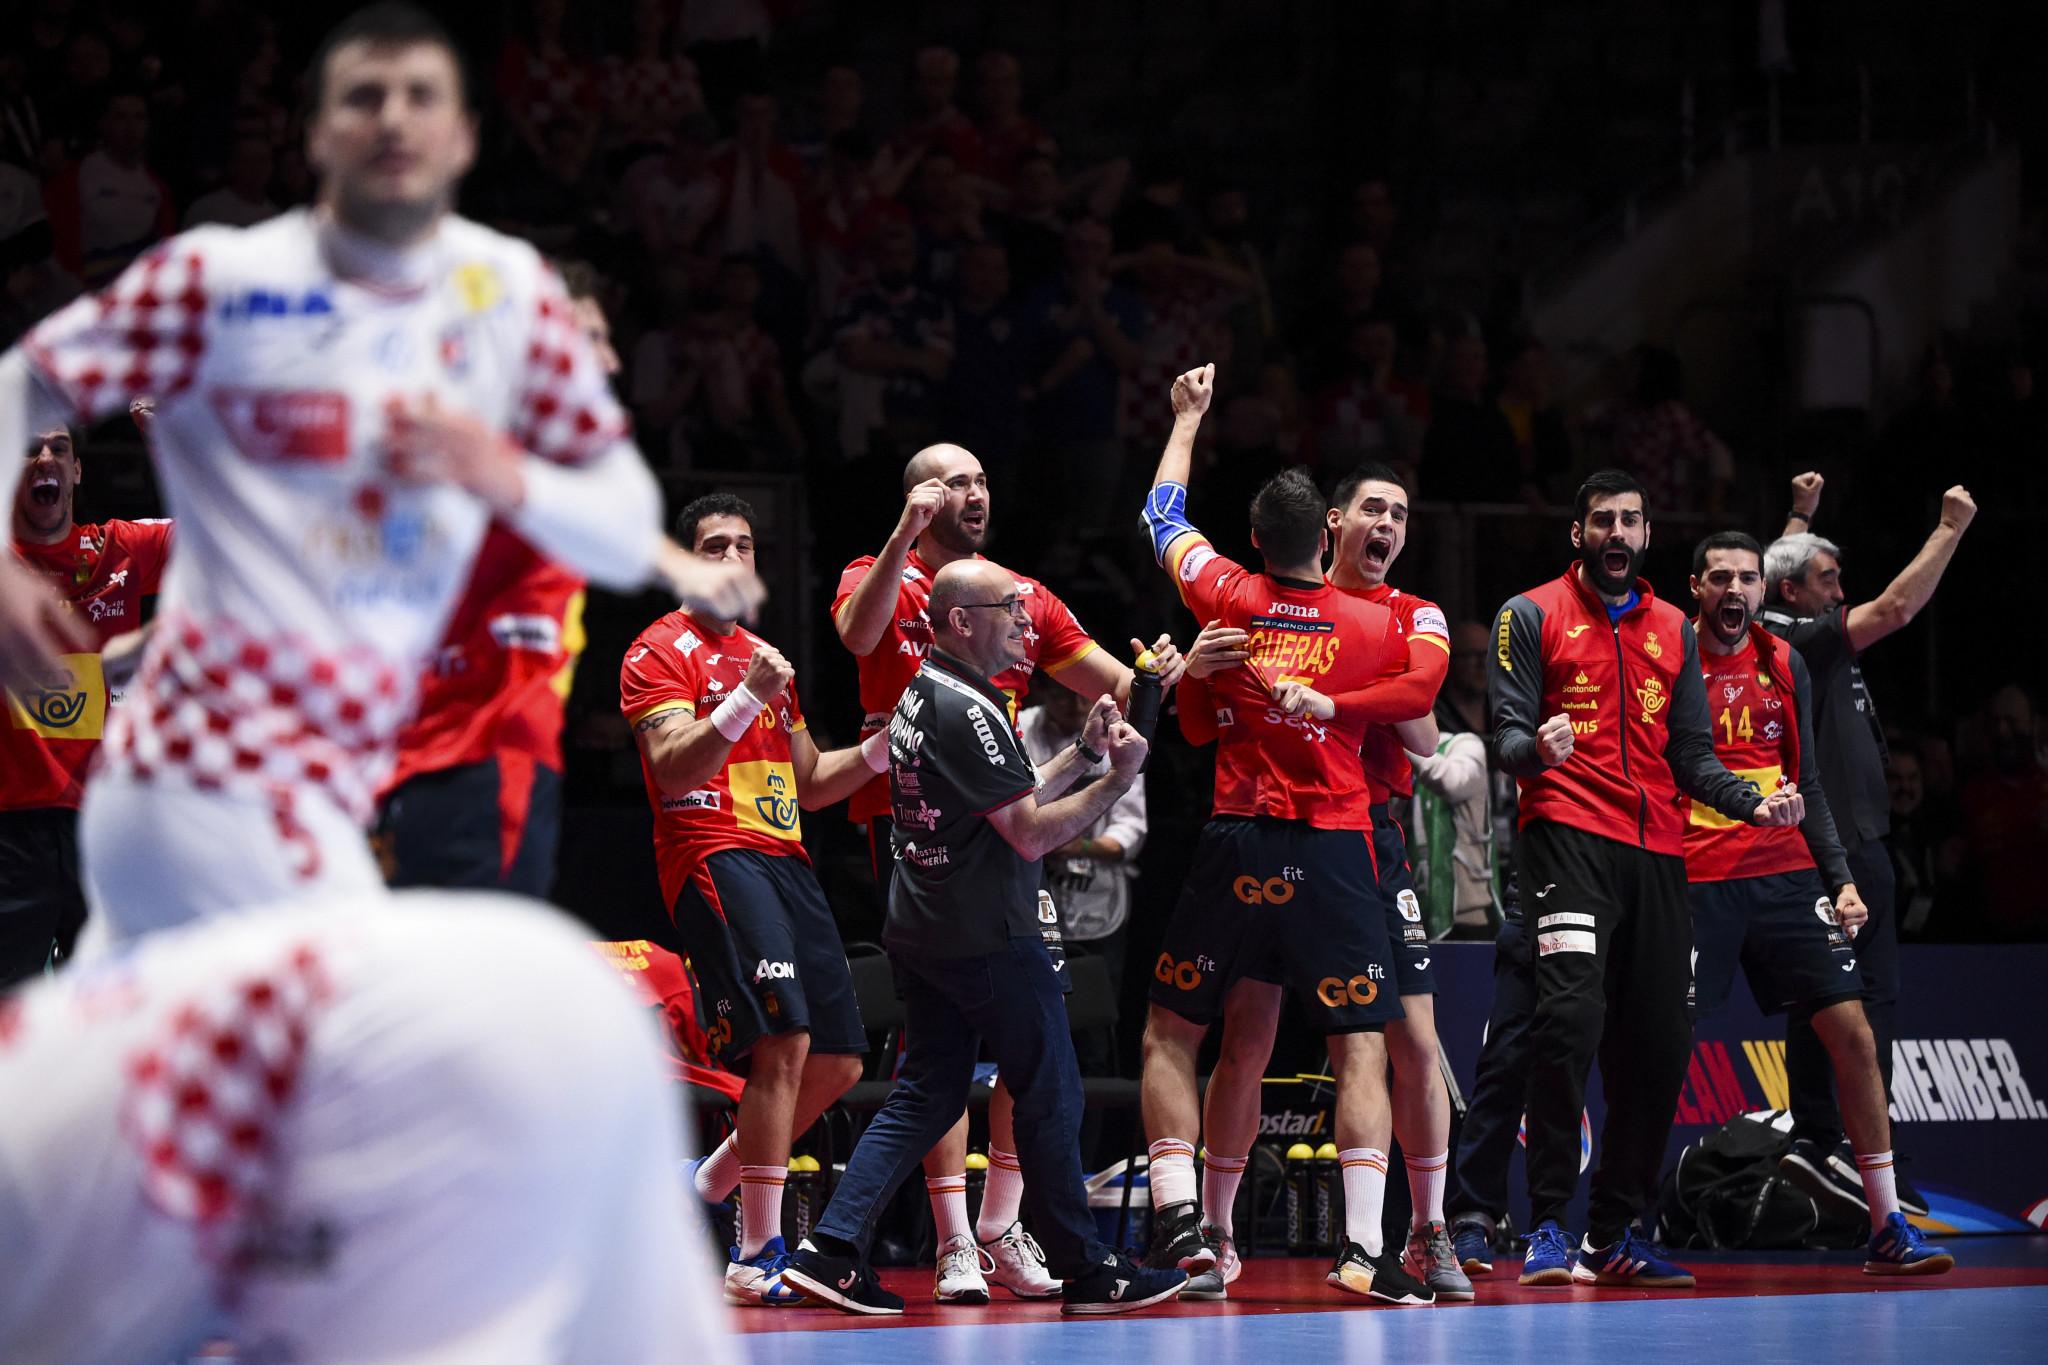 Spain retain European Men's Handball Championship after tight final versus Croatia